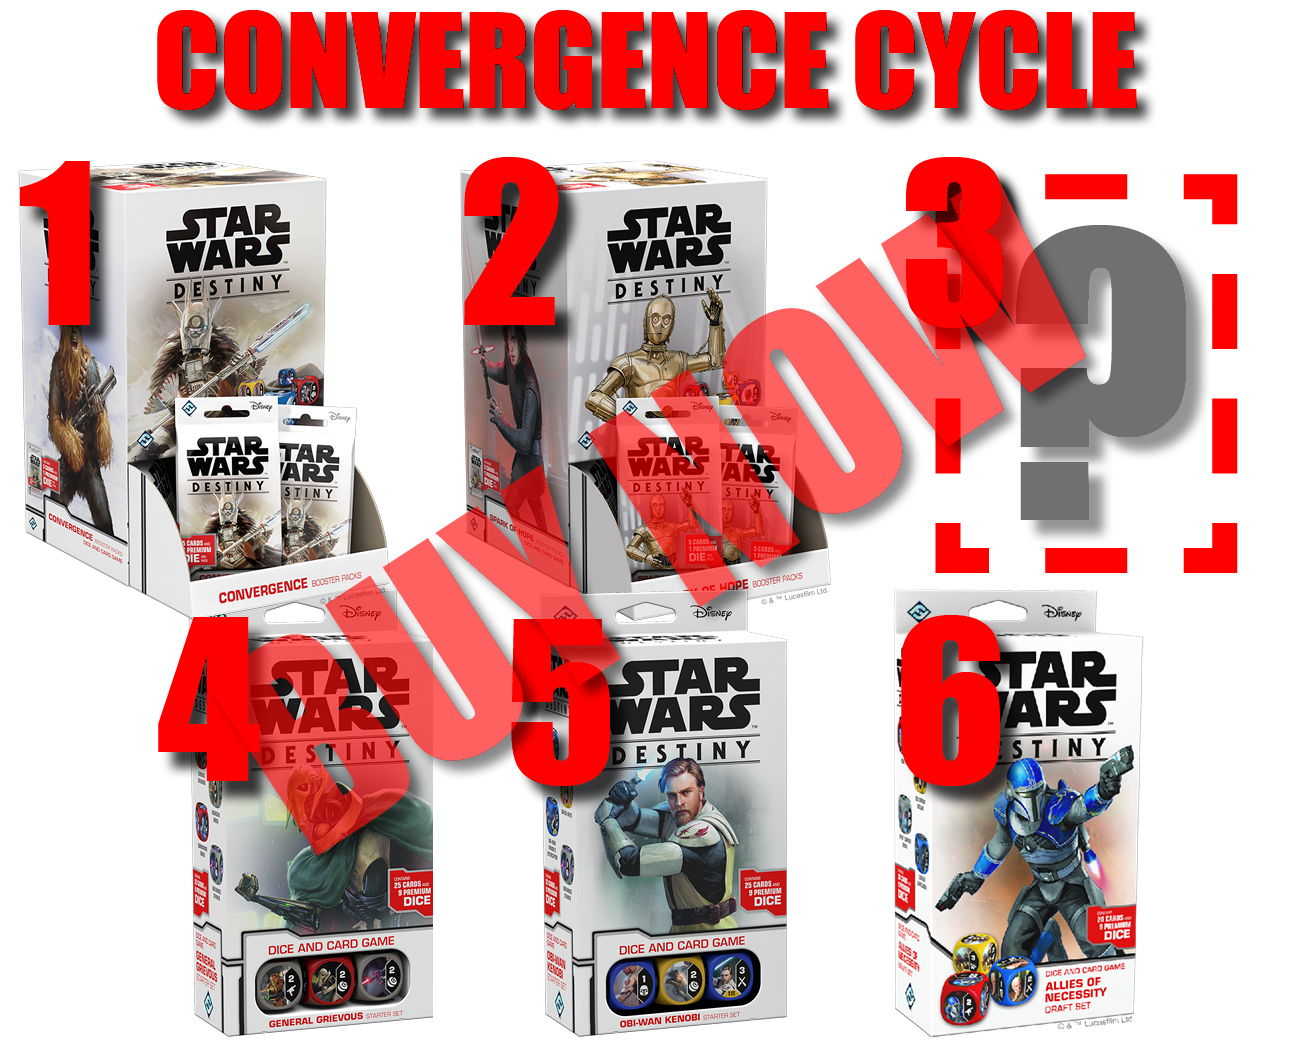 Convergence Cycle soh BUY GUIDEjpg